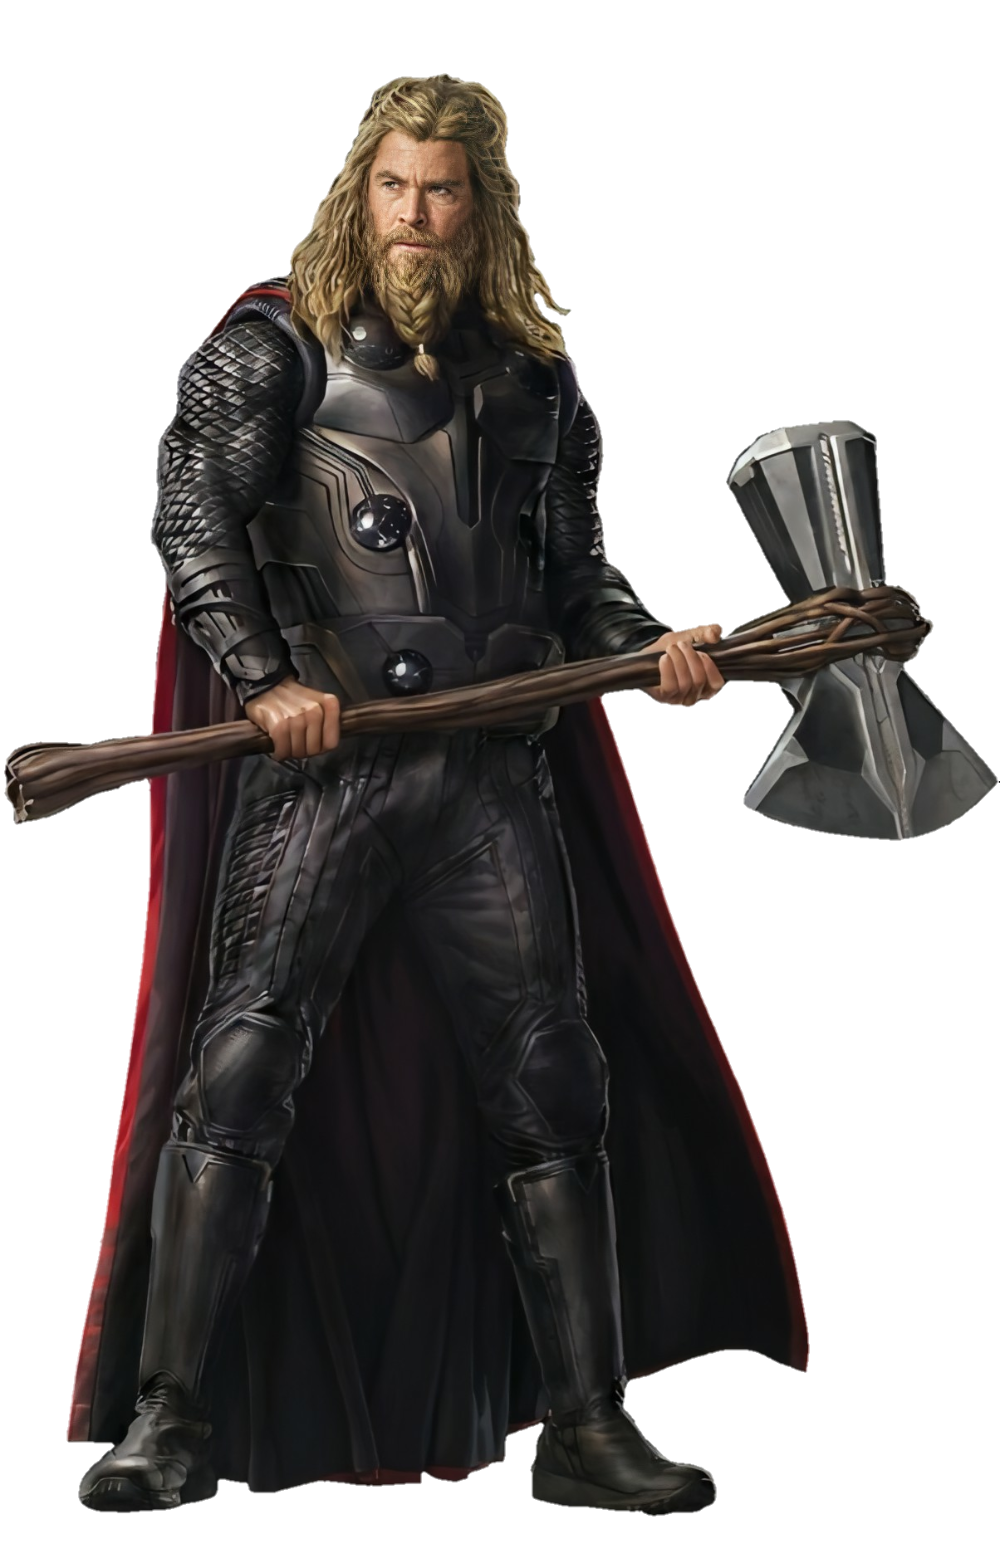 Avengers Endgame Thor Png By Metropolis Hero1125 On Deviantart The Mighty Thor Thor Wallpaper Thor Art